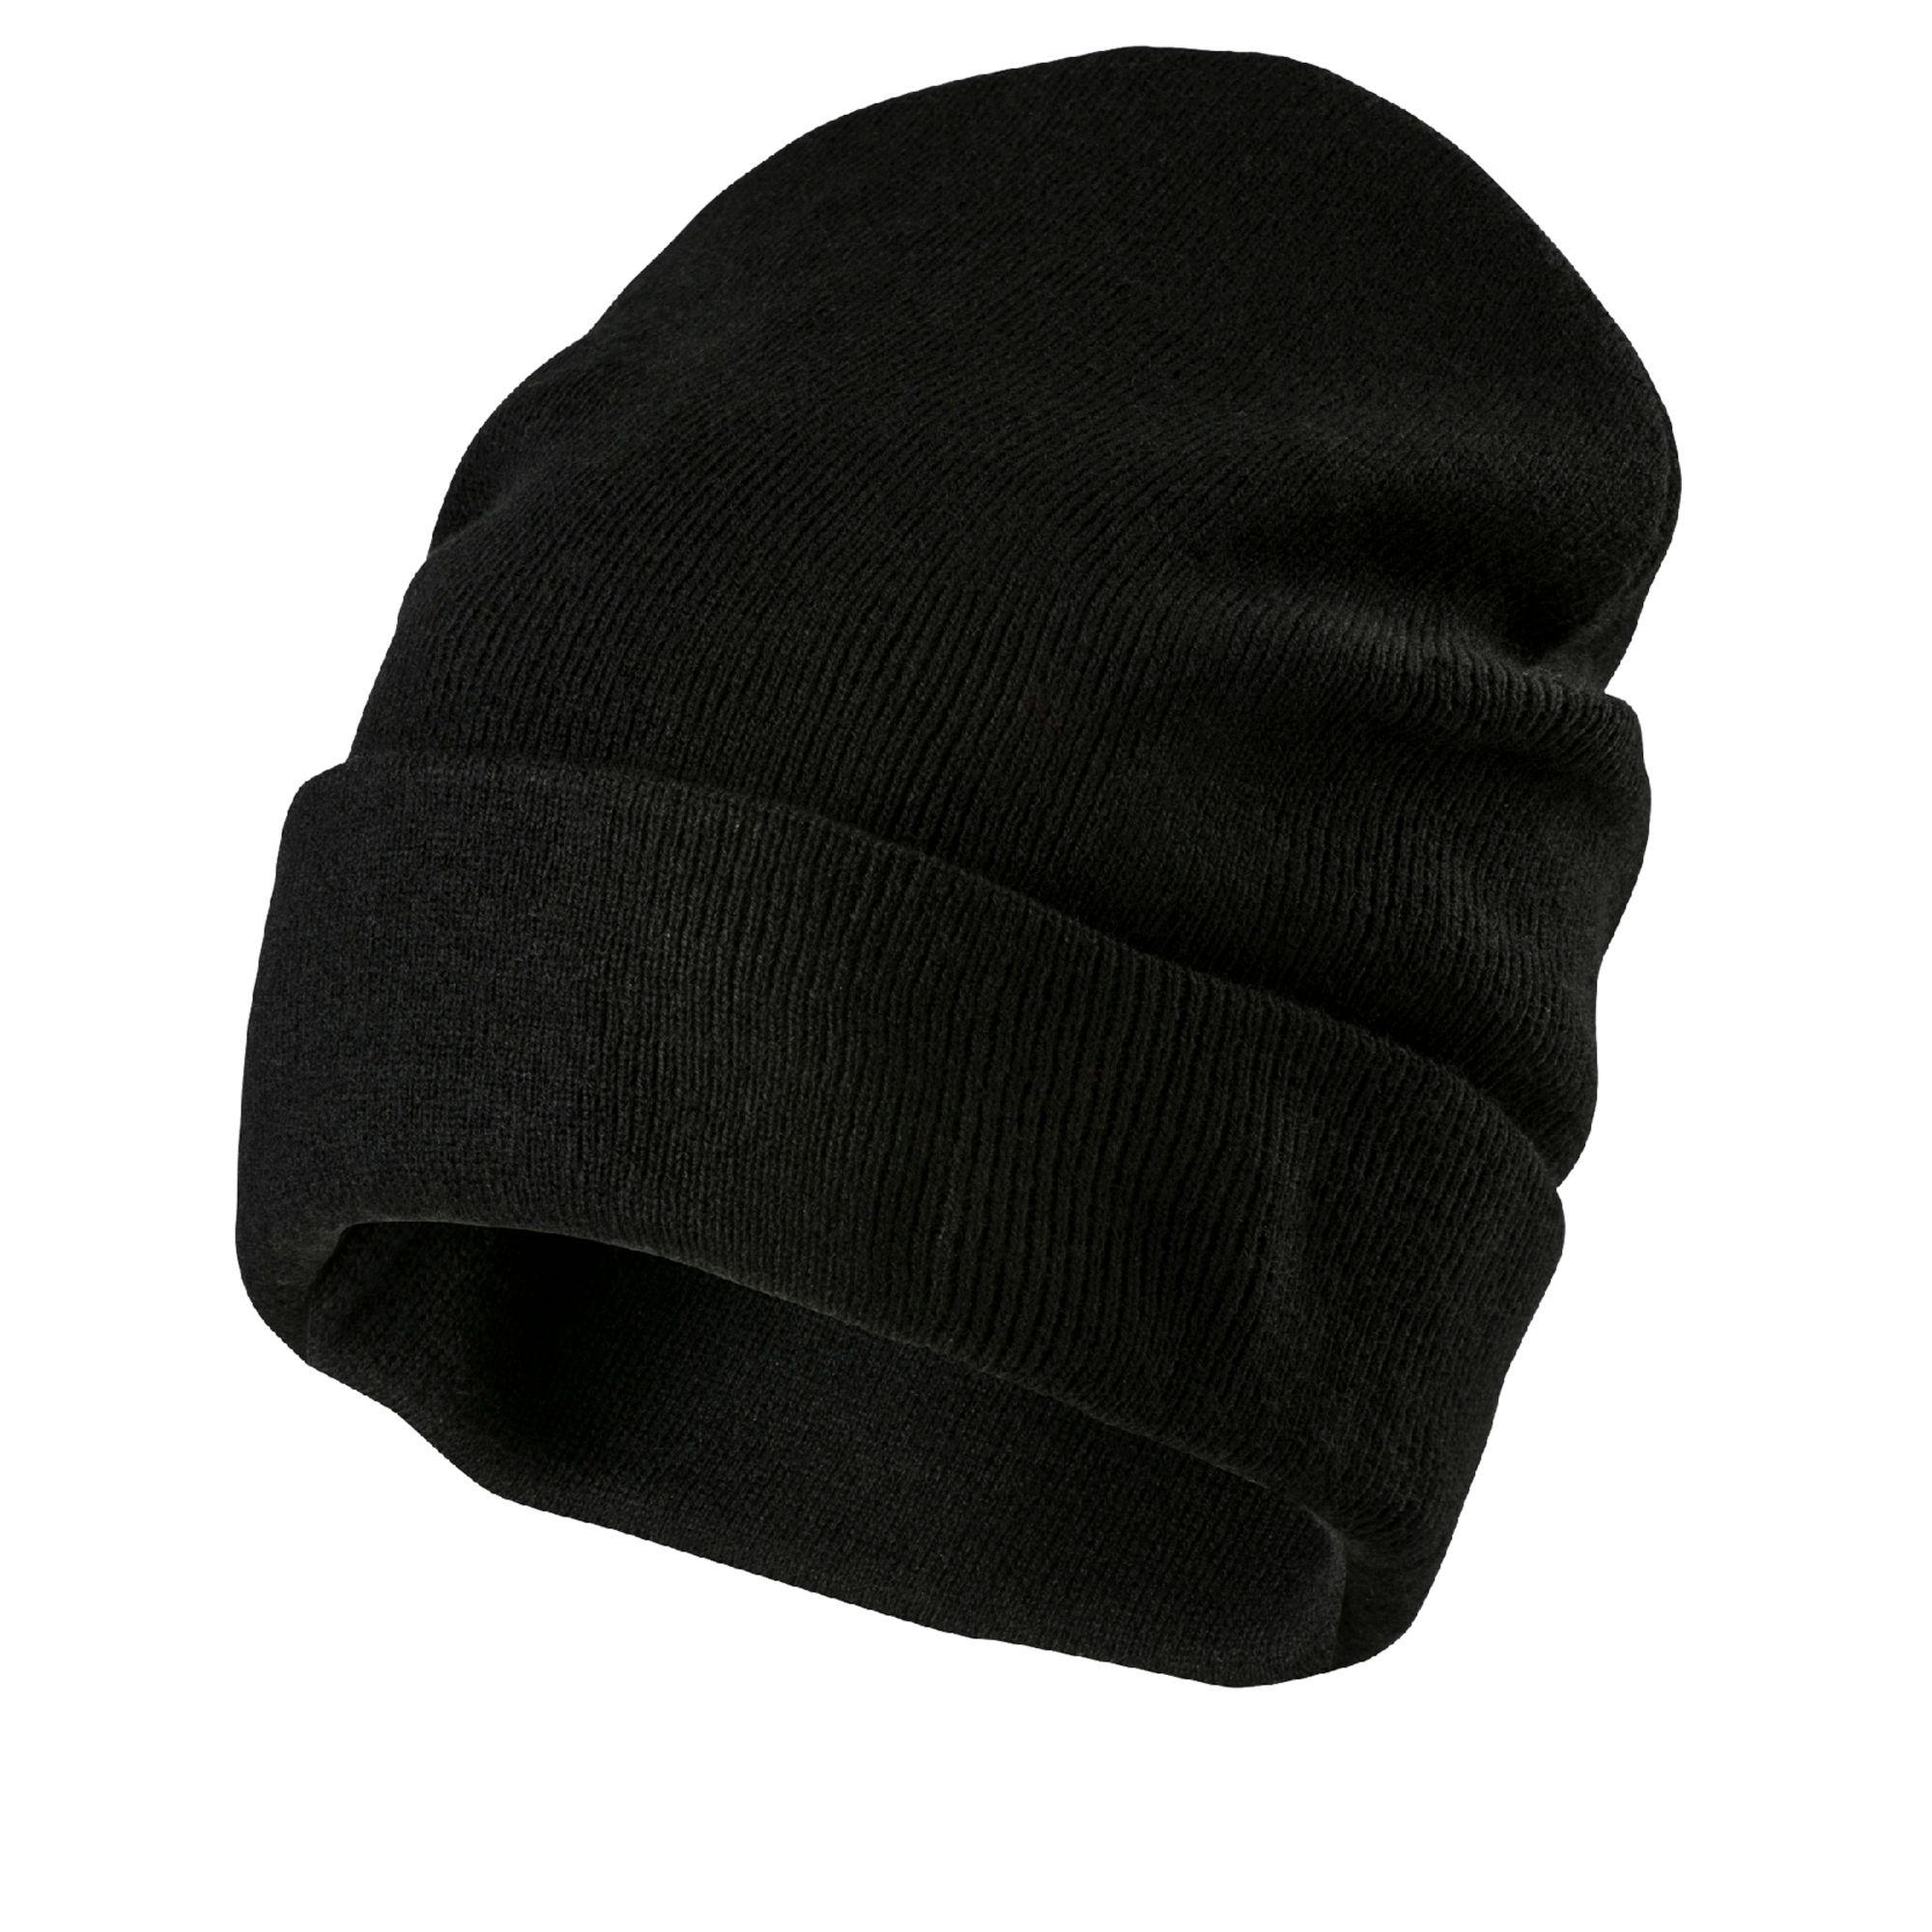 ФЕНТИ унисекс открытый шапочки